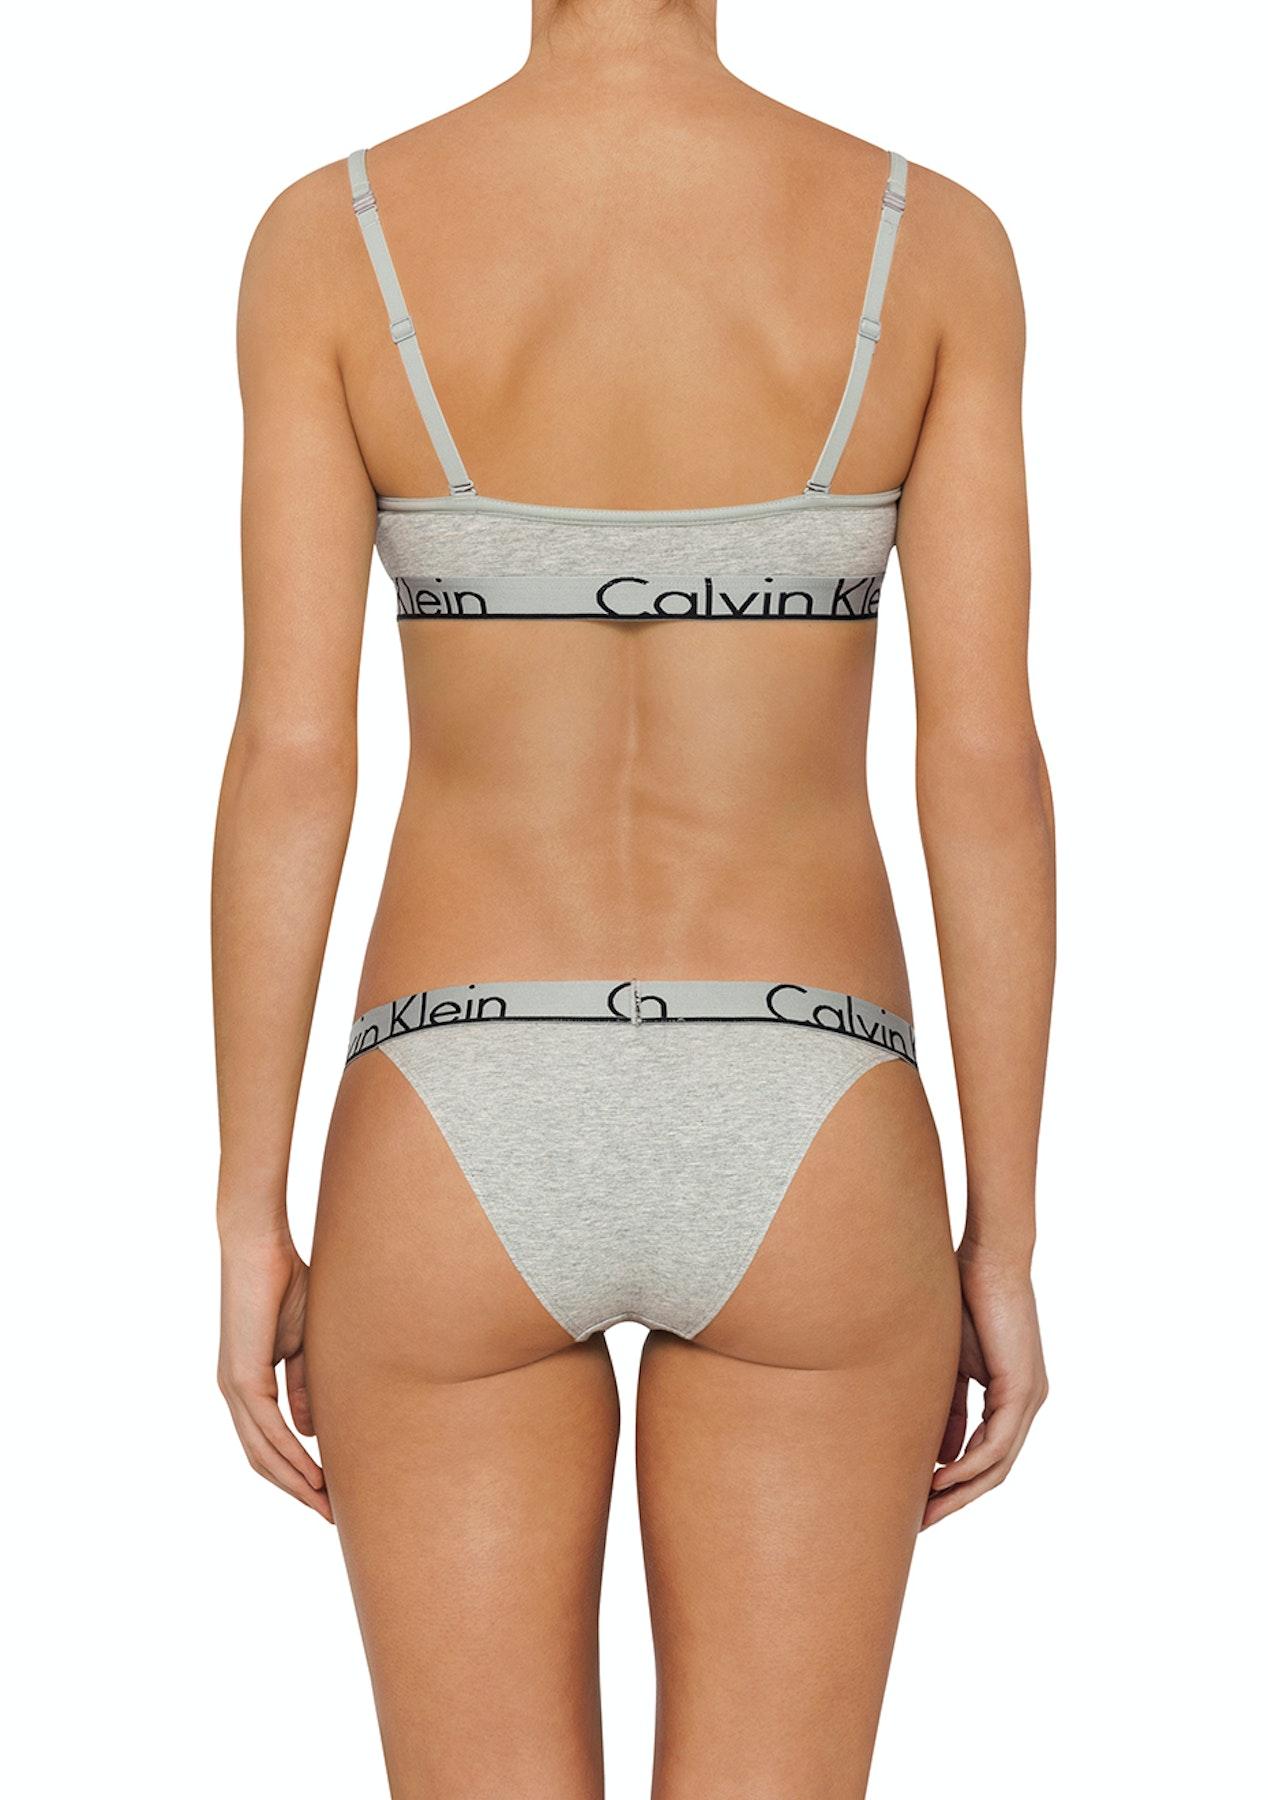 329d76a787b8d Calvin Klein - Triangle Unlined Bralette - Grey Heather - Womens Garage  Sale - Onceit